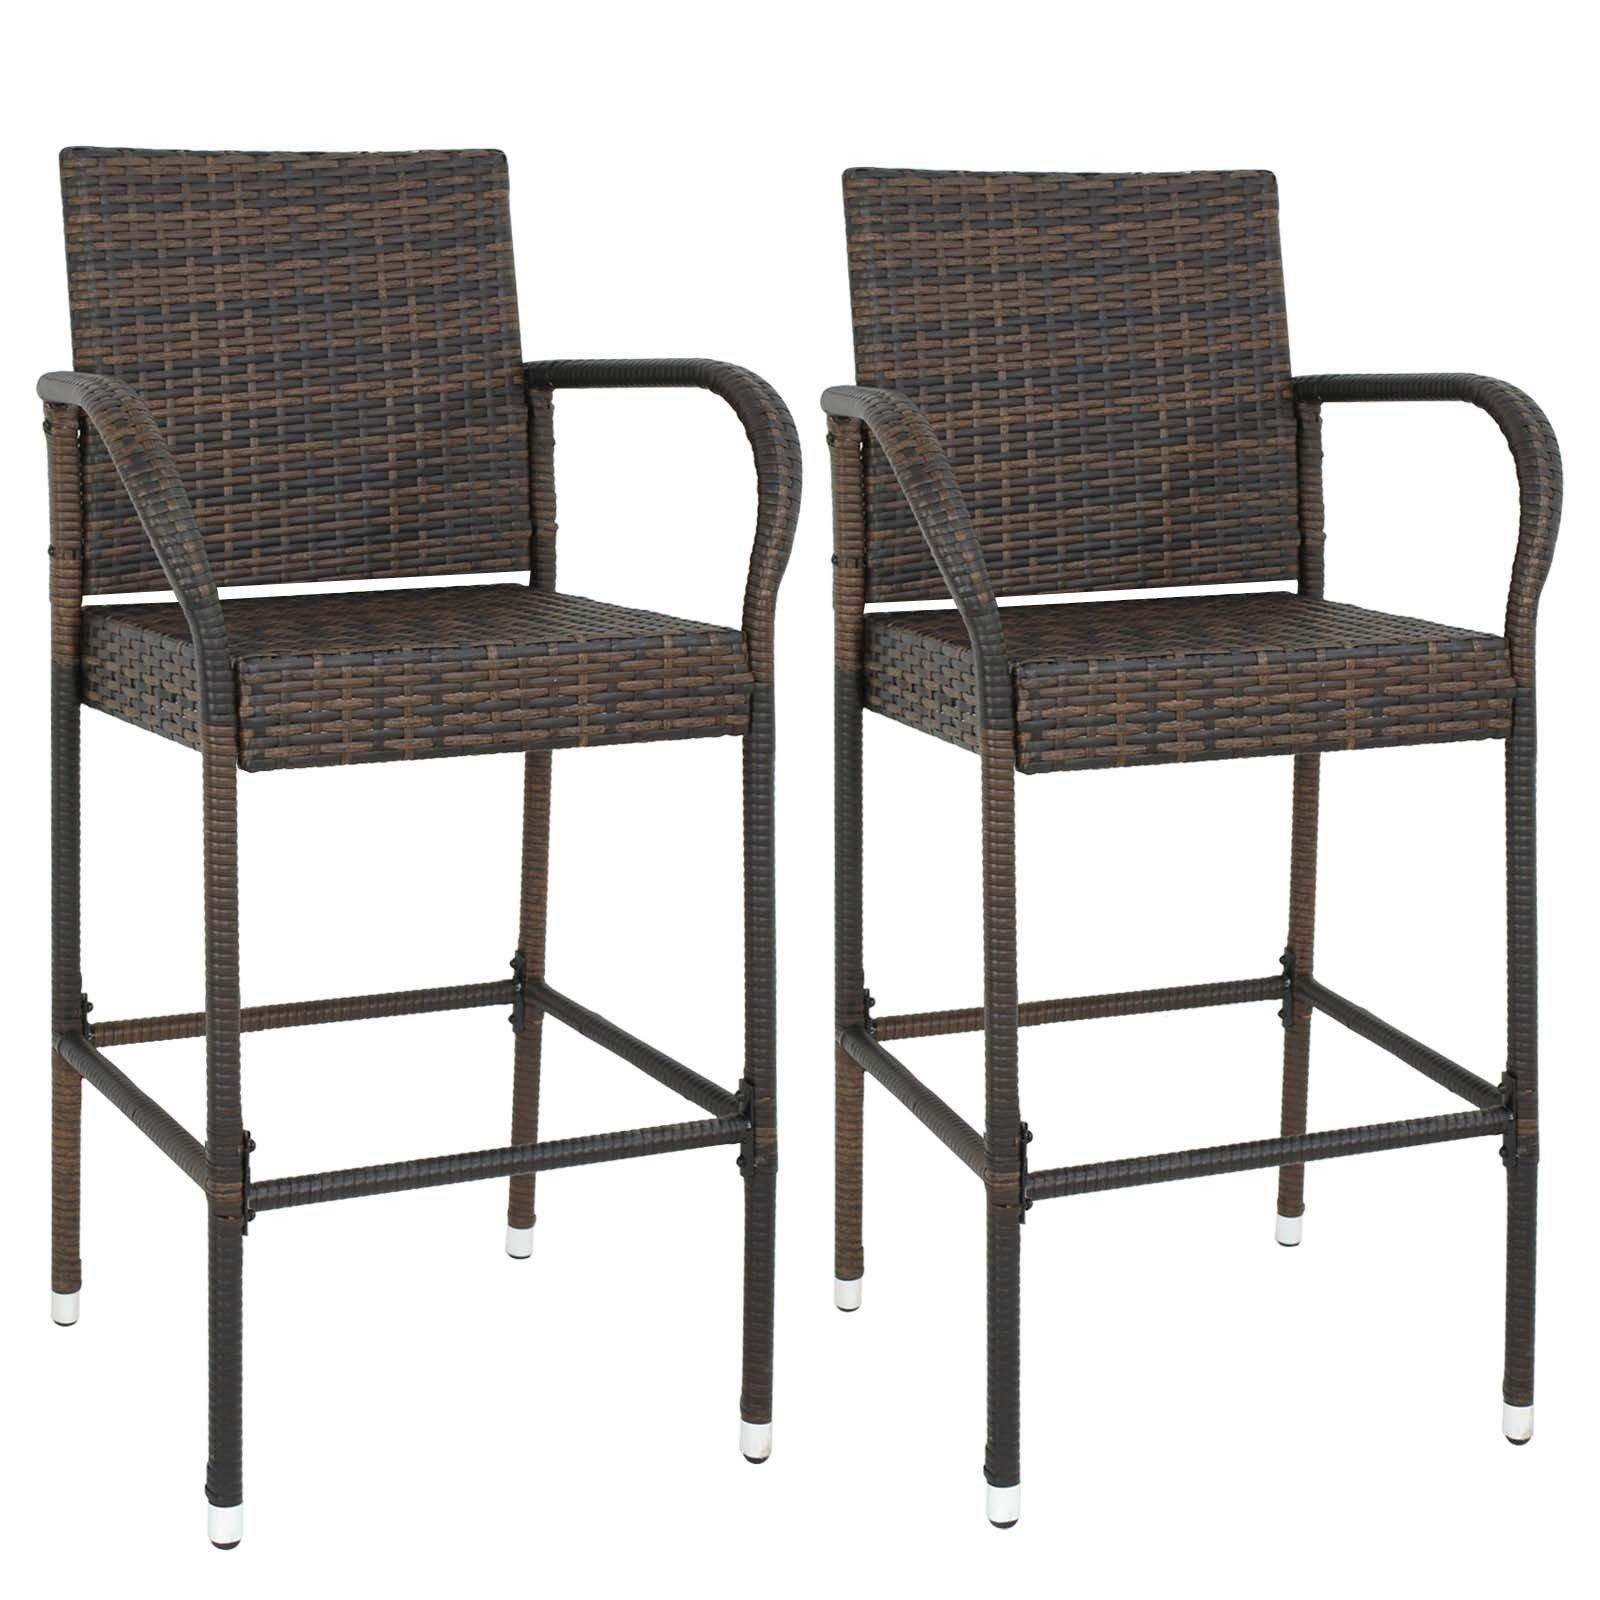 2 pcs Rattan Armrest Chair #GSMN by Bright Sun (Image #1)